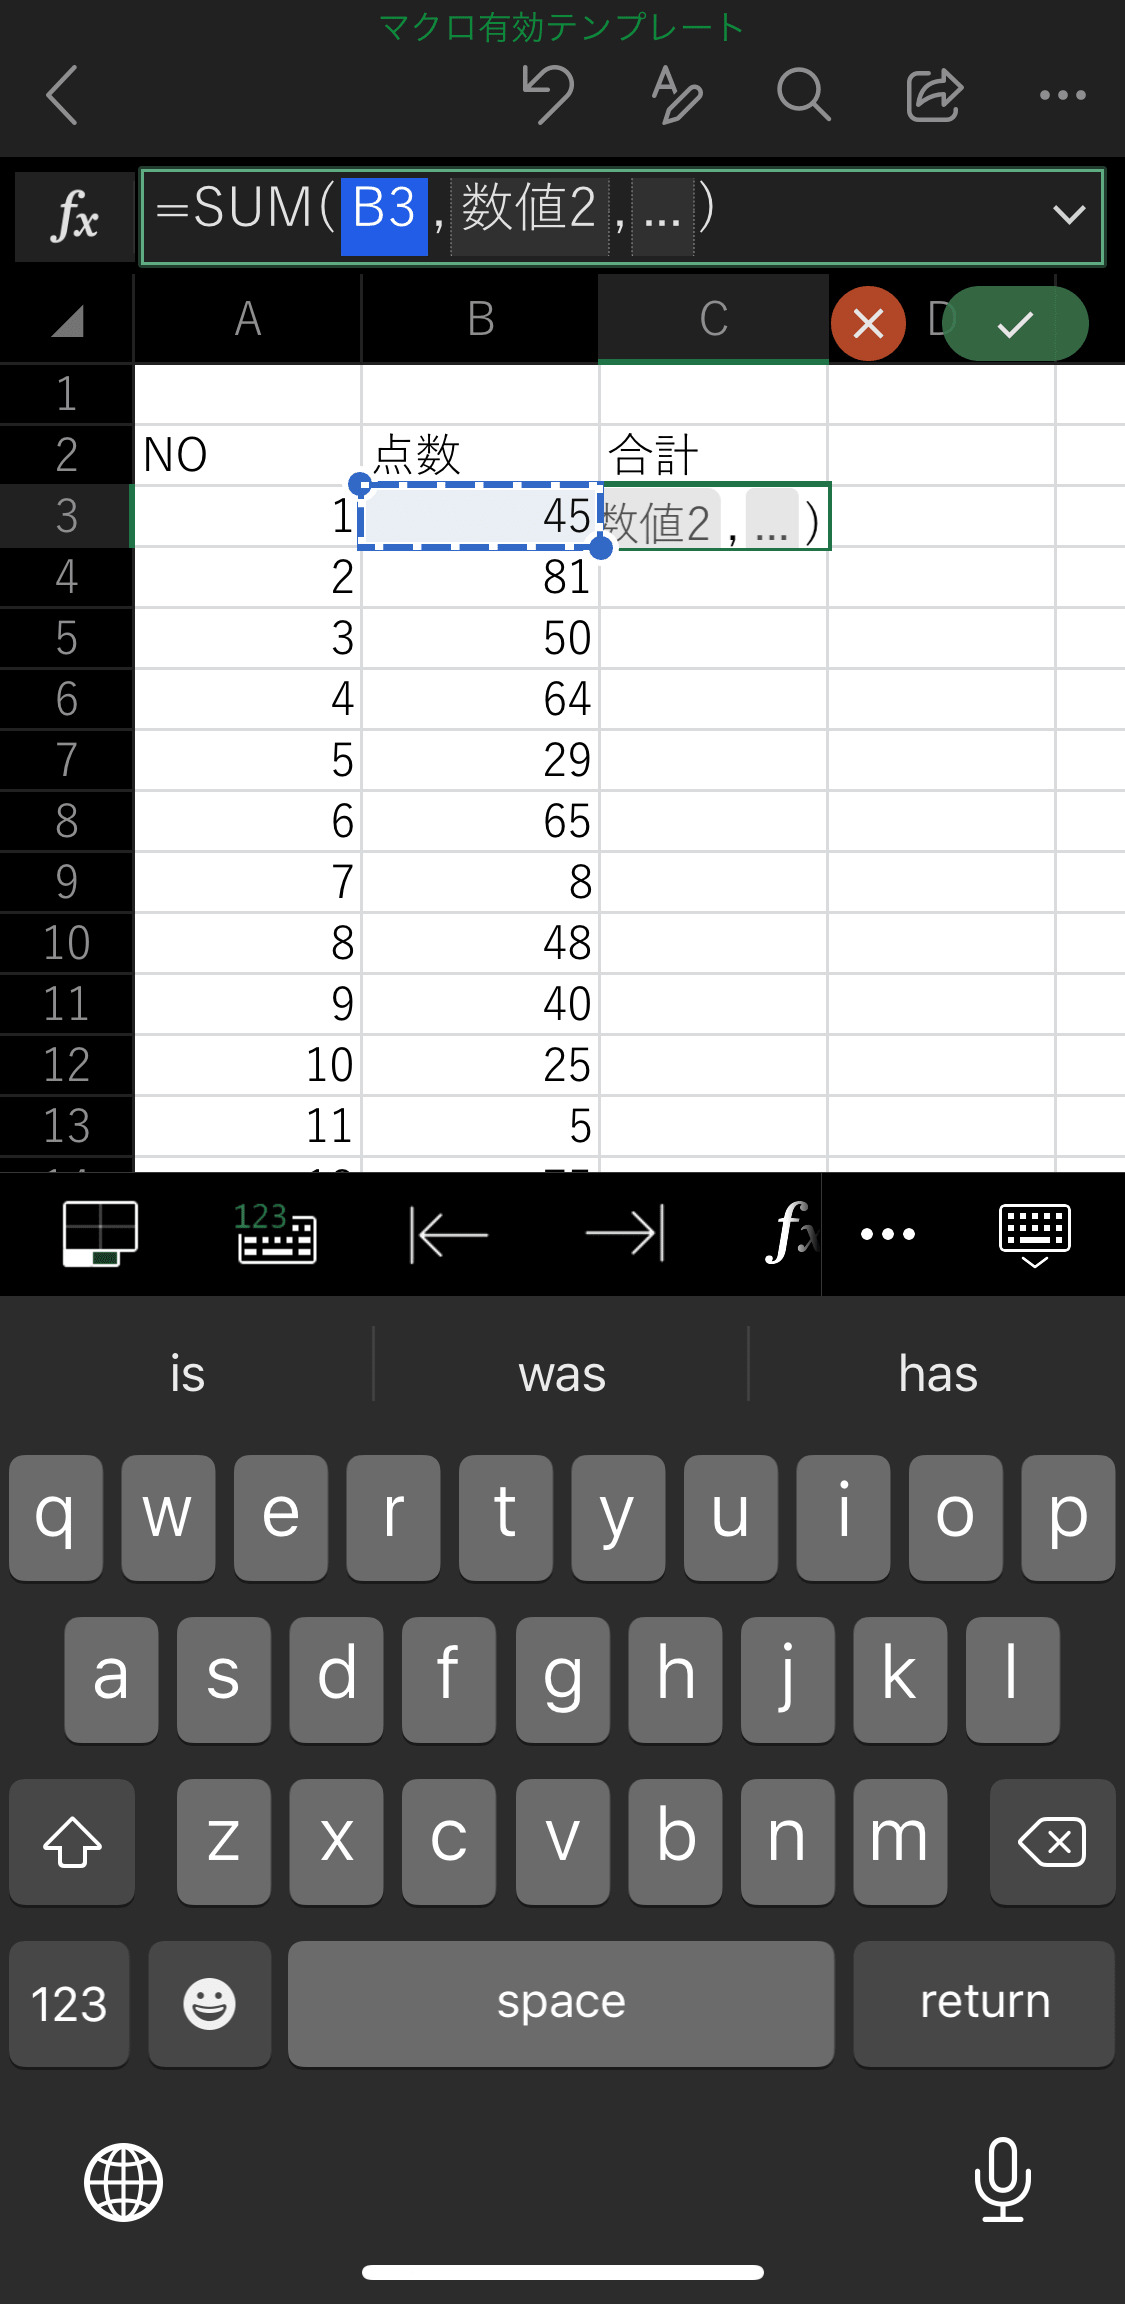 iPhoneでのエクセルアプリの使い方・編集方法・保存方法16